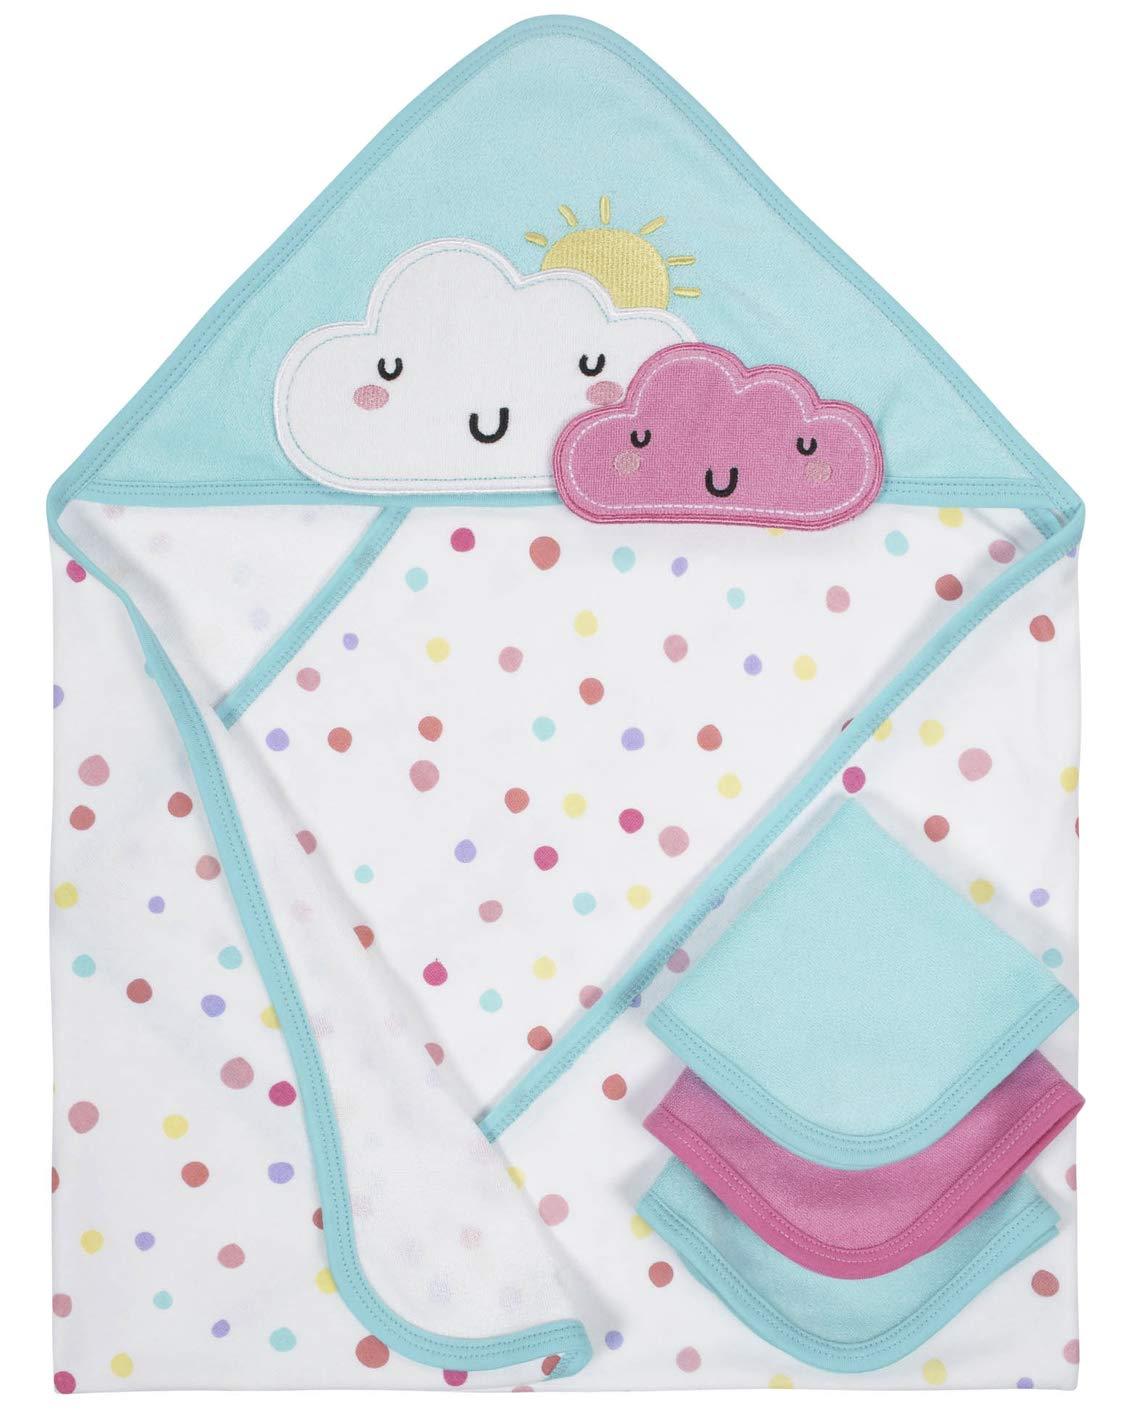 Organic Cotton Hooded Towel and Washcloths Bath Set, 4pc (Baby Girl)